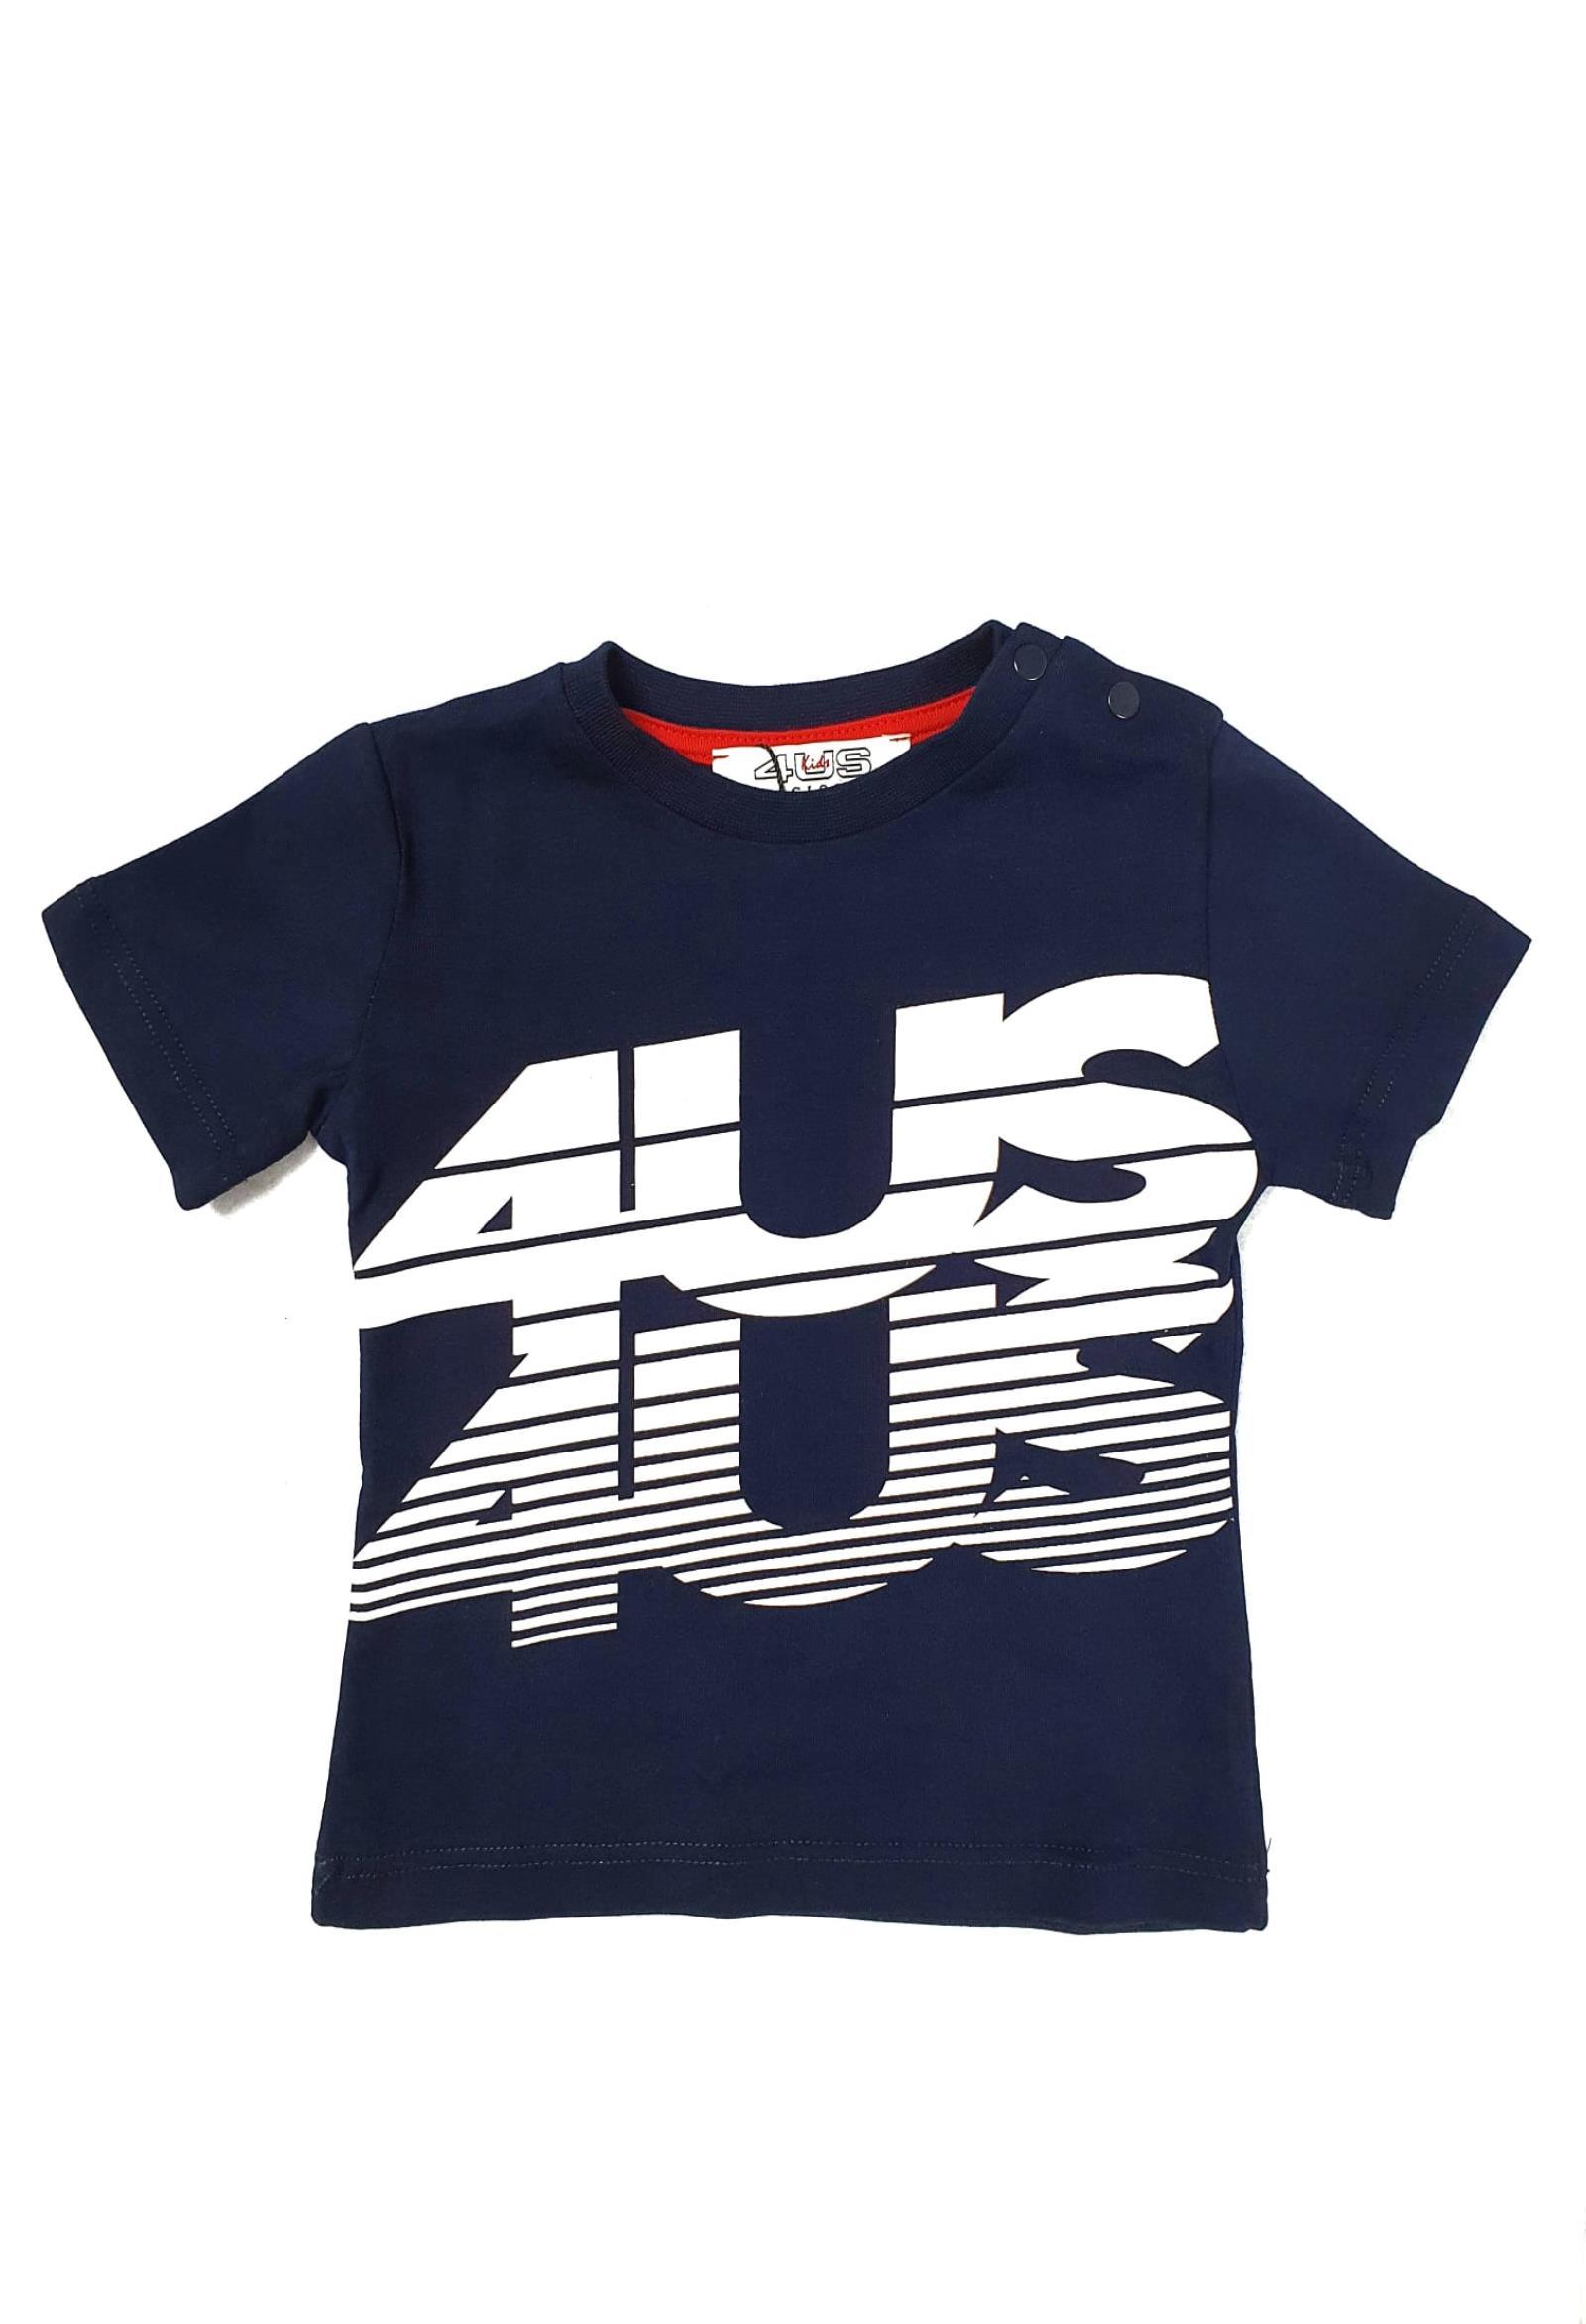 T-SHIRT BLU 4US cesare paciotti   T-shirt   TSP1155BUNIBLU